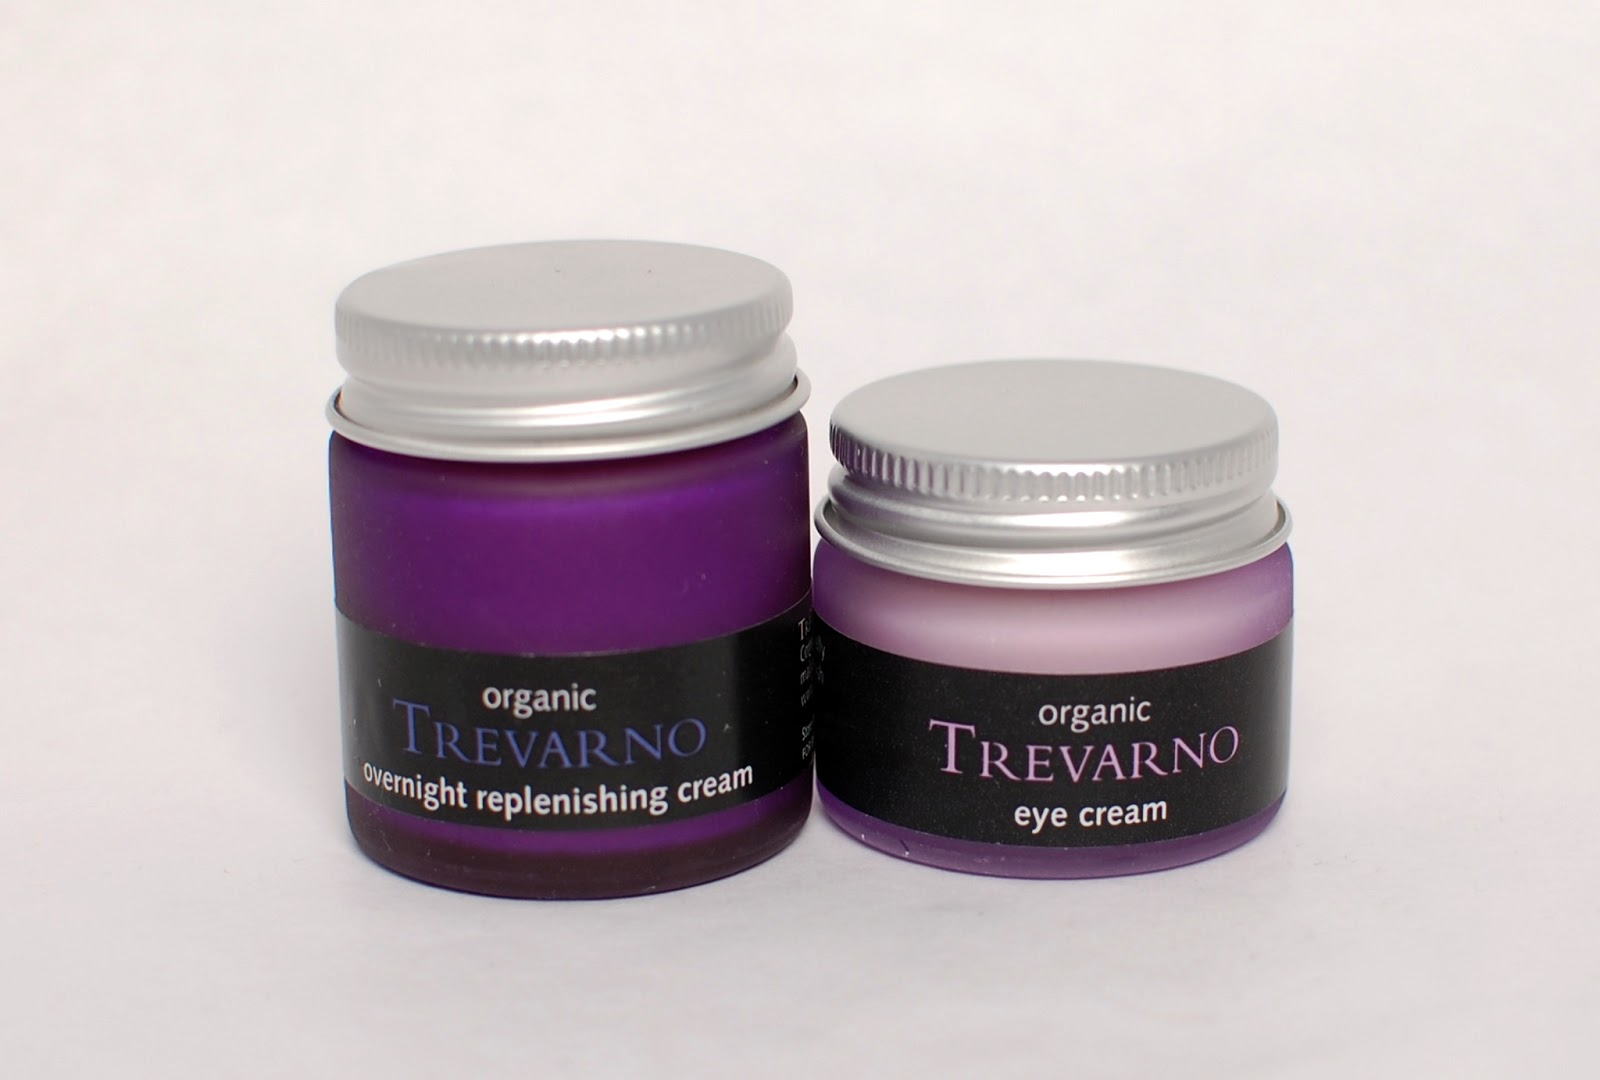 Trevarno Overnight Replenishing Cream, Eye Cream